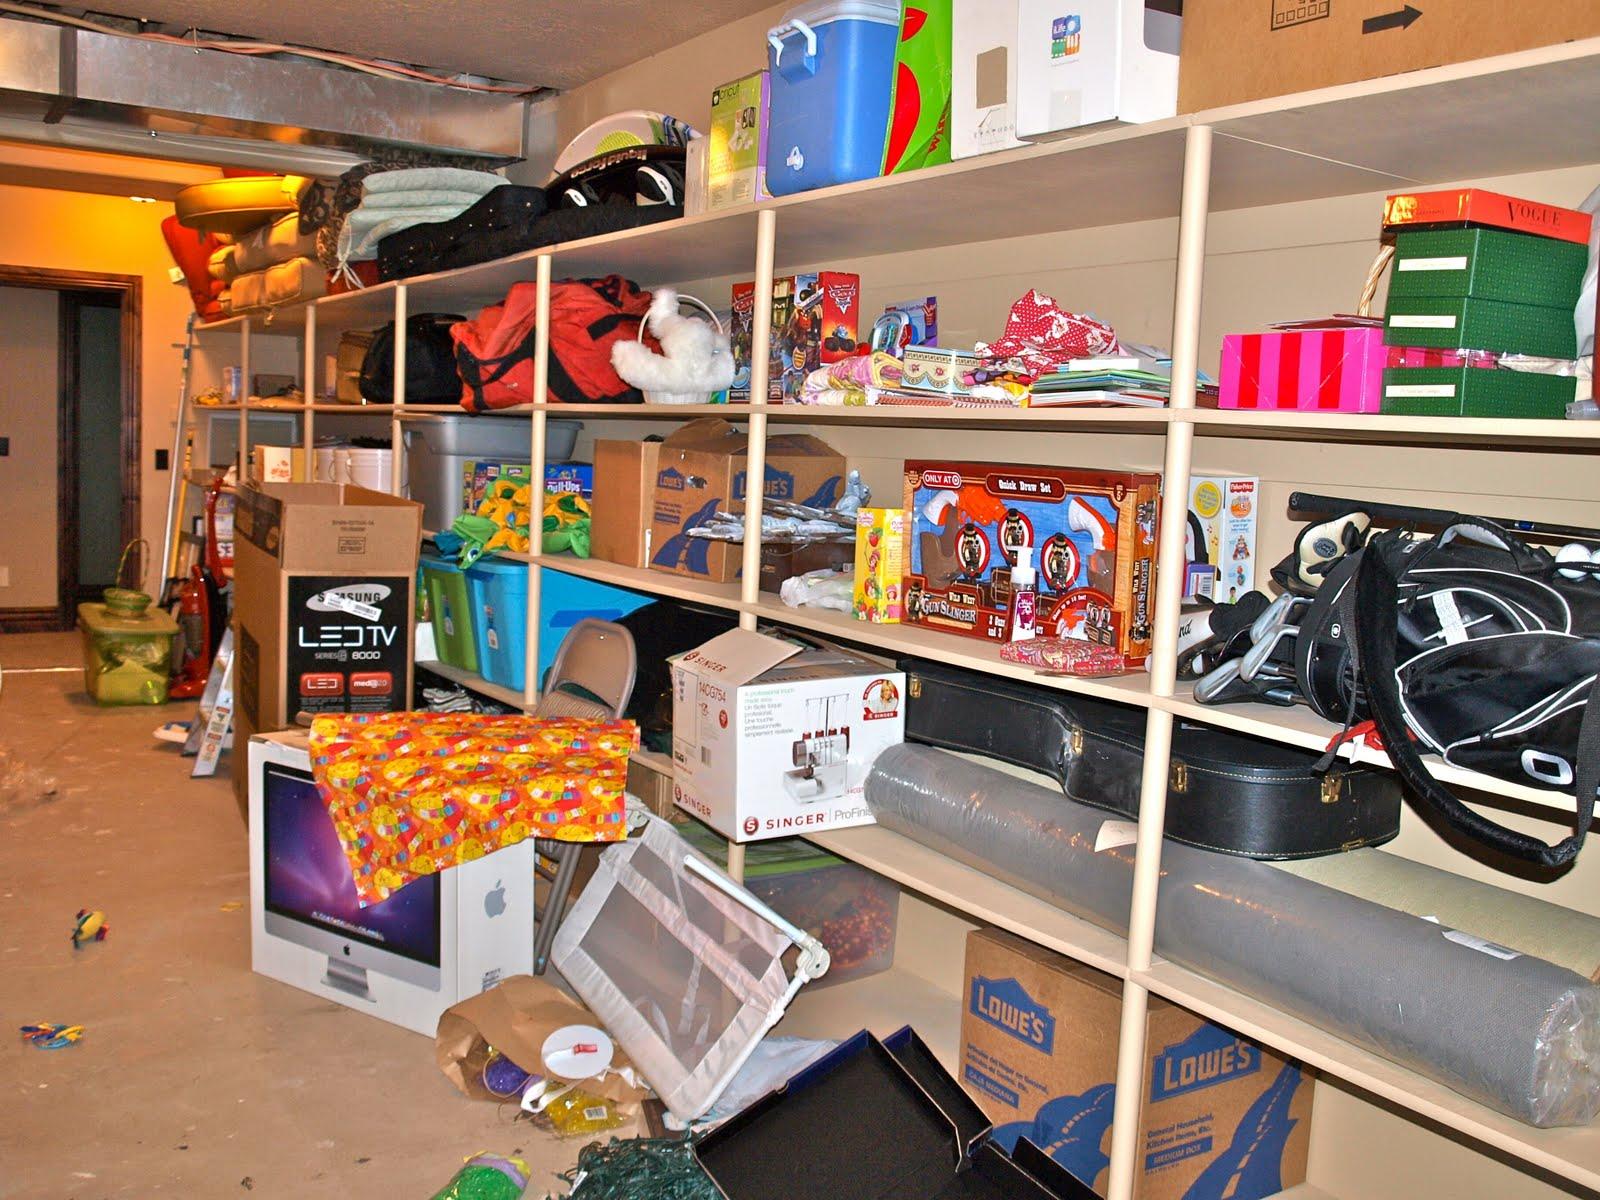 Originate And Renovate Storage Room Clean Up